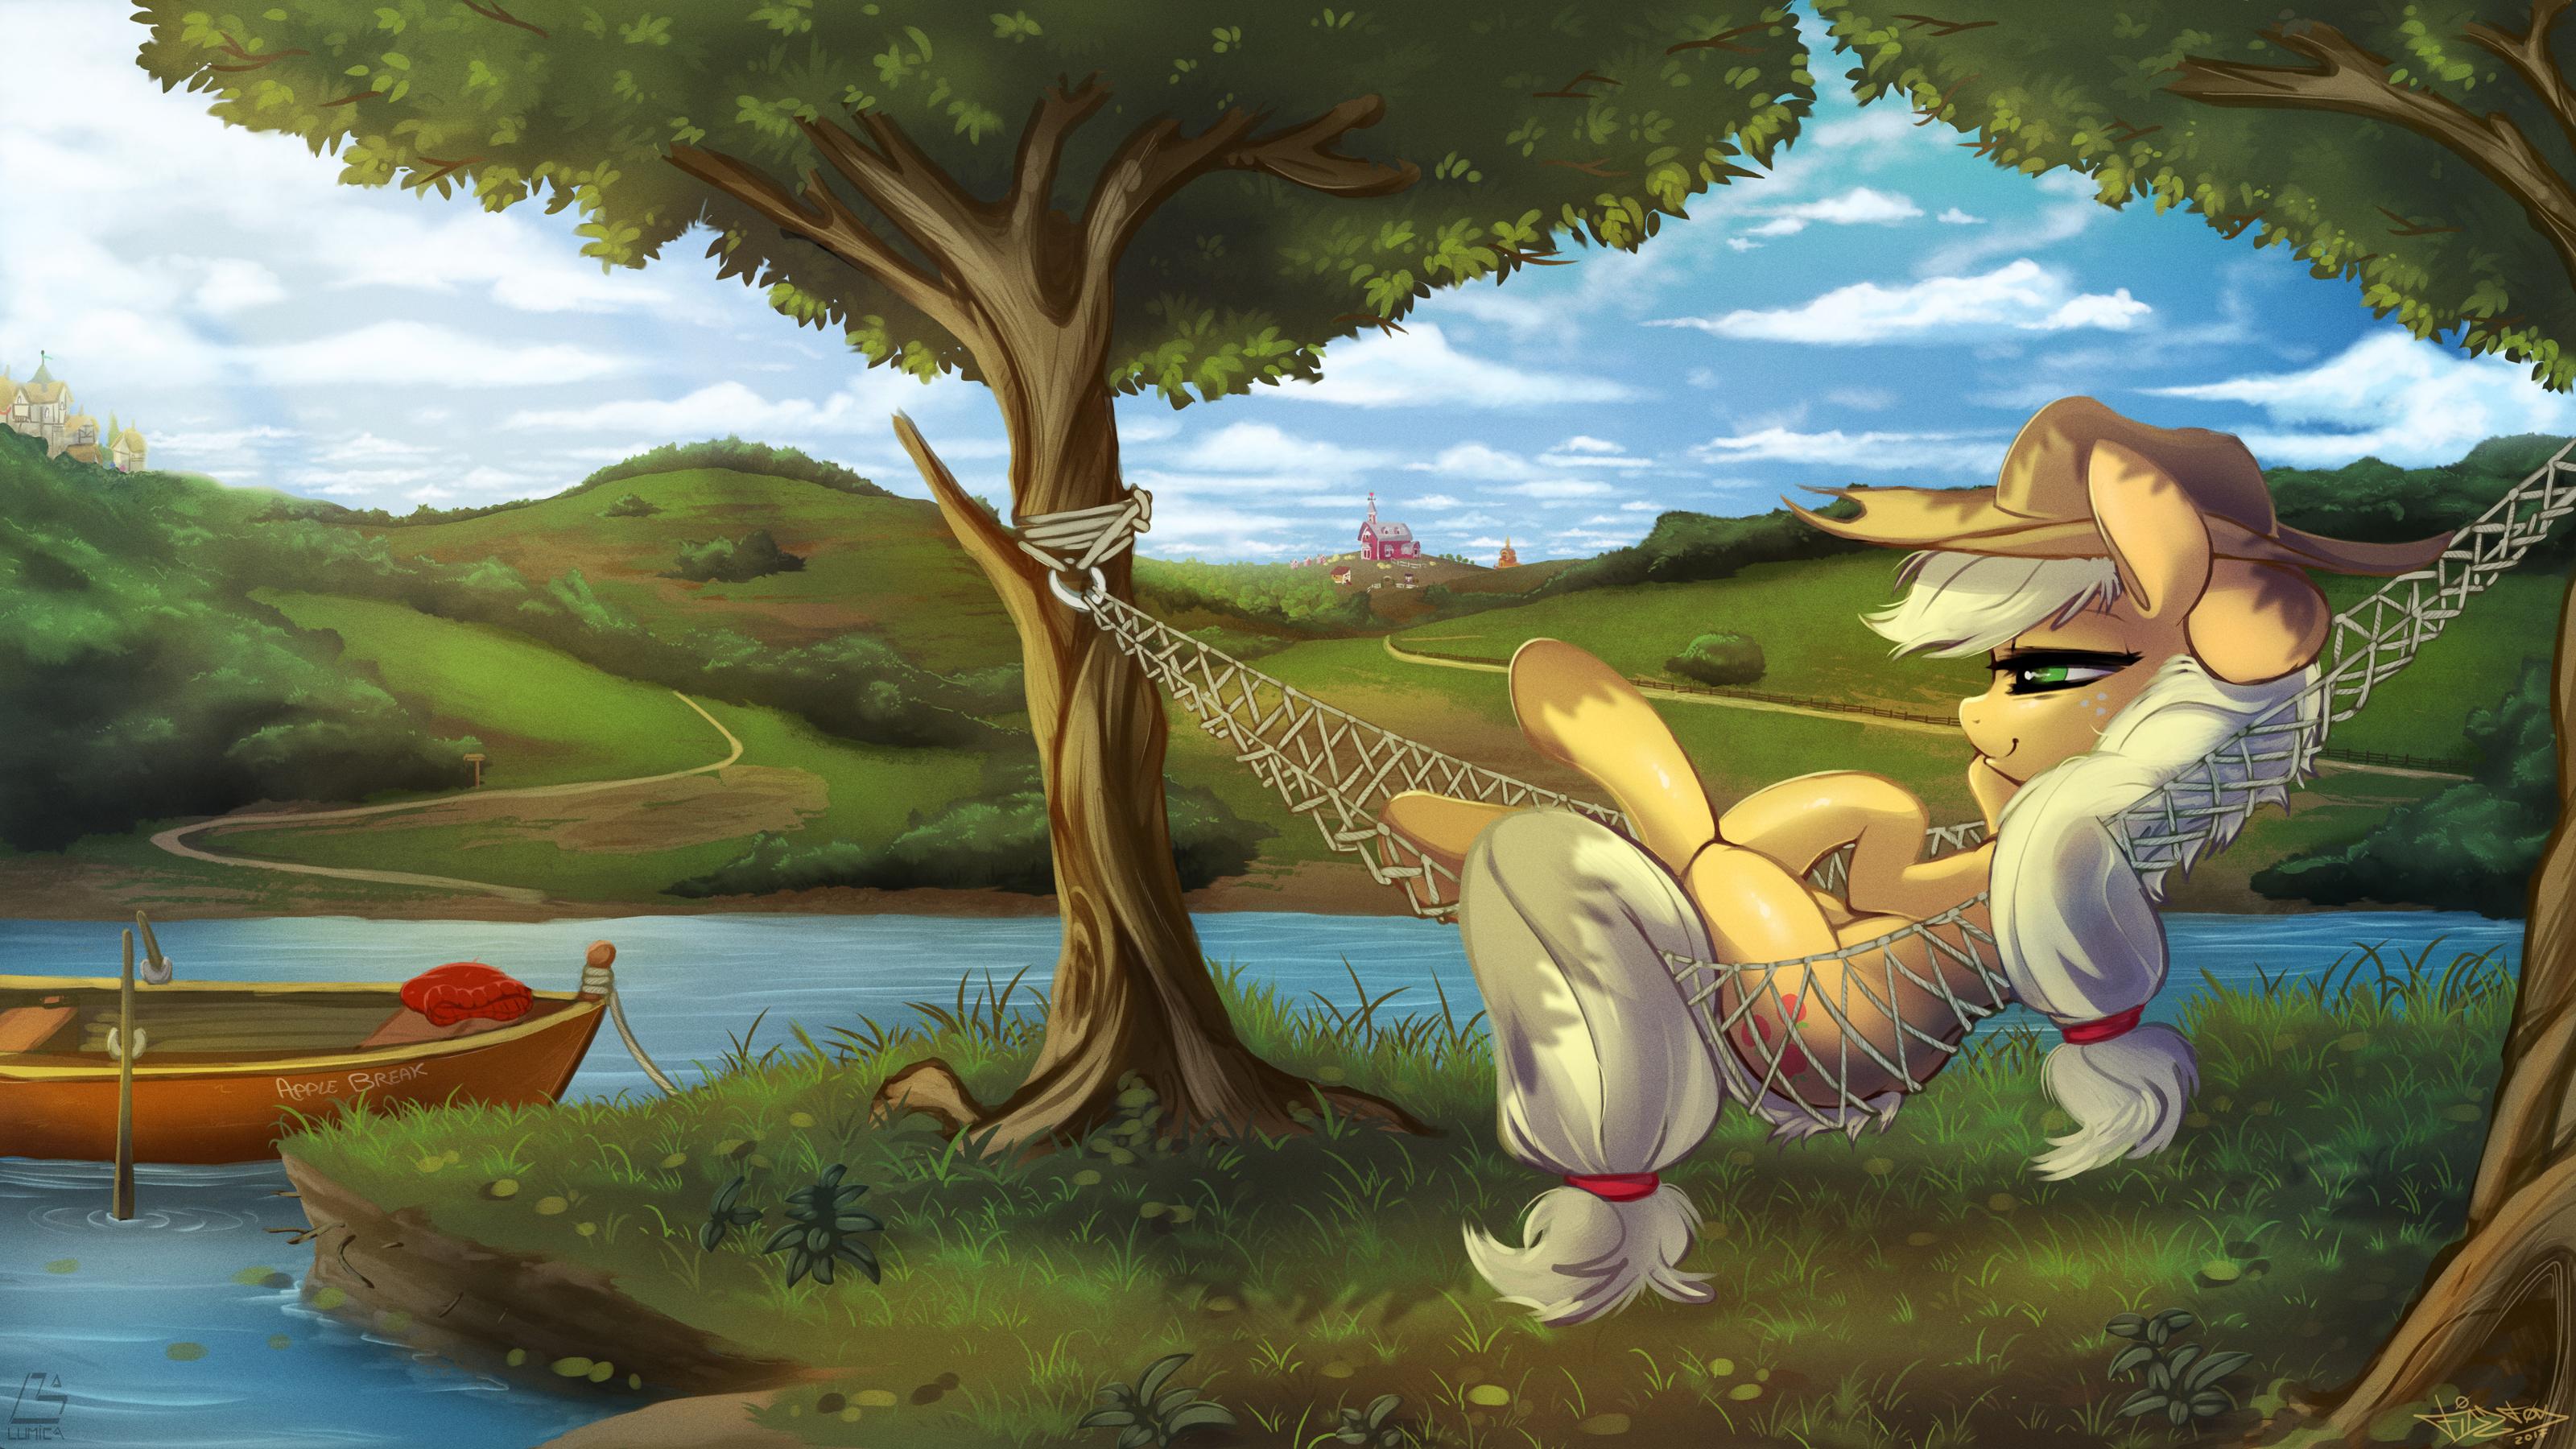 Applejack's chill spot. by FidzFox